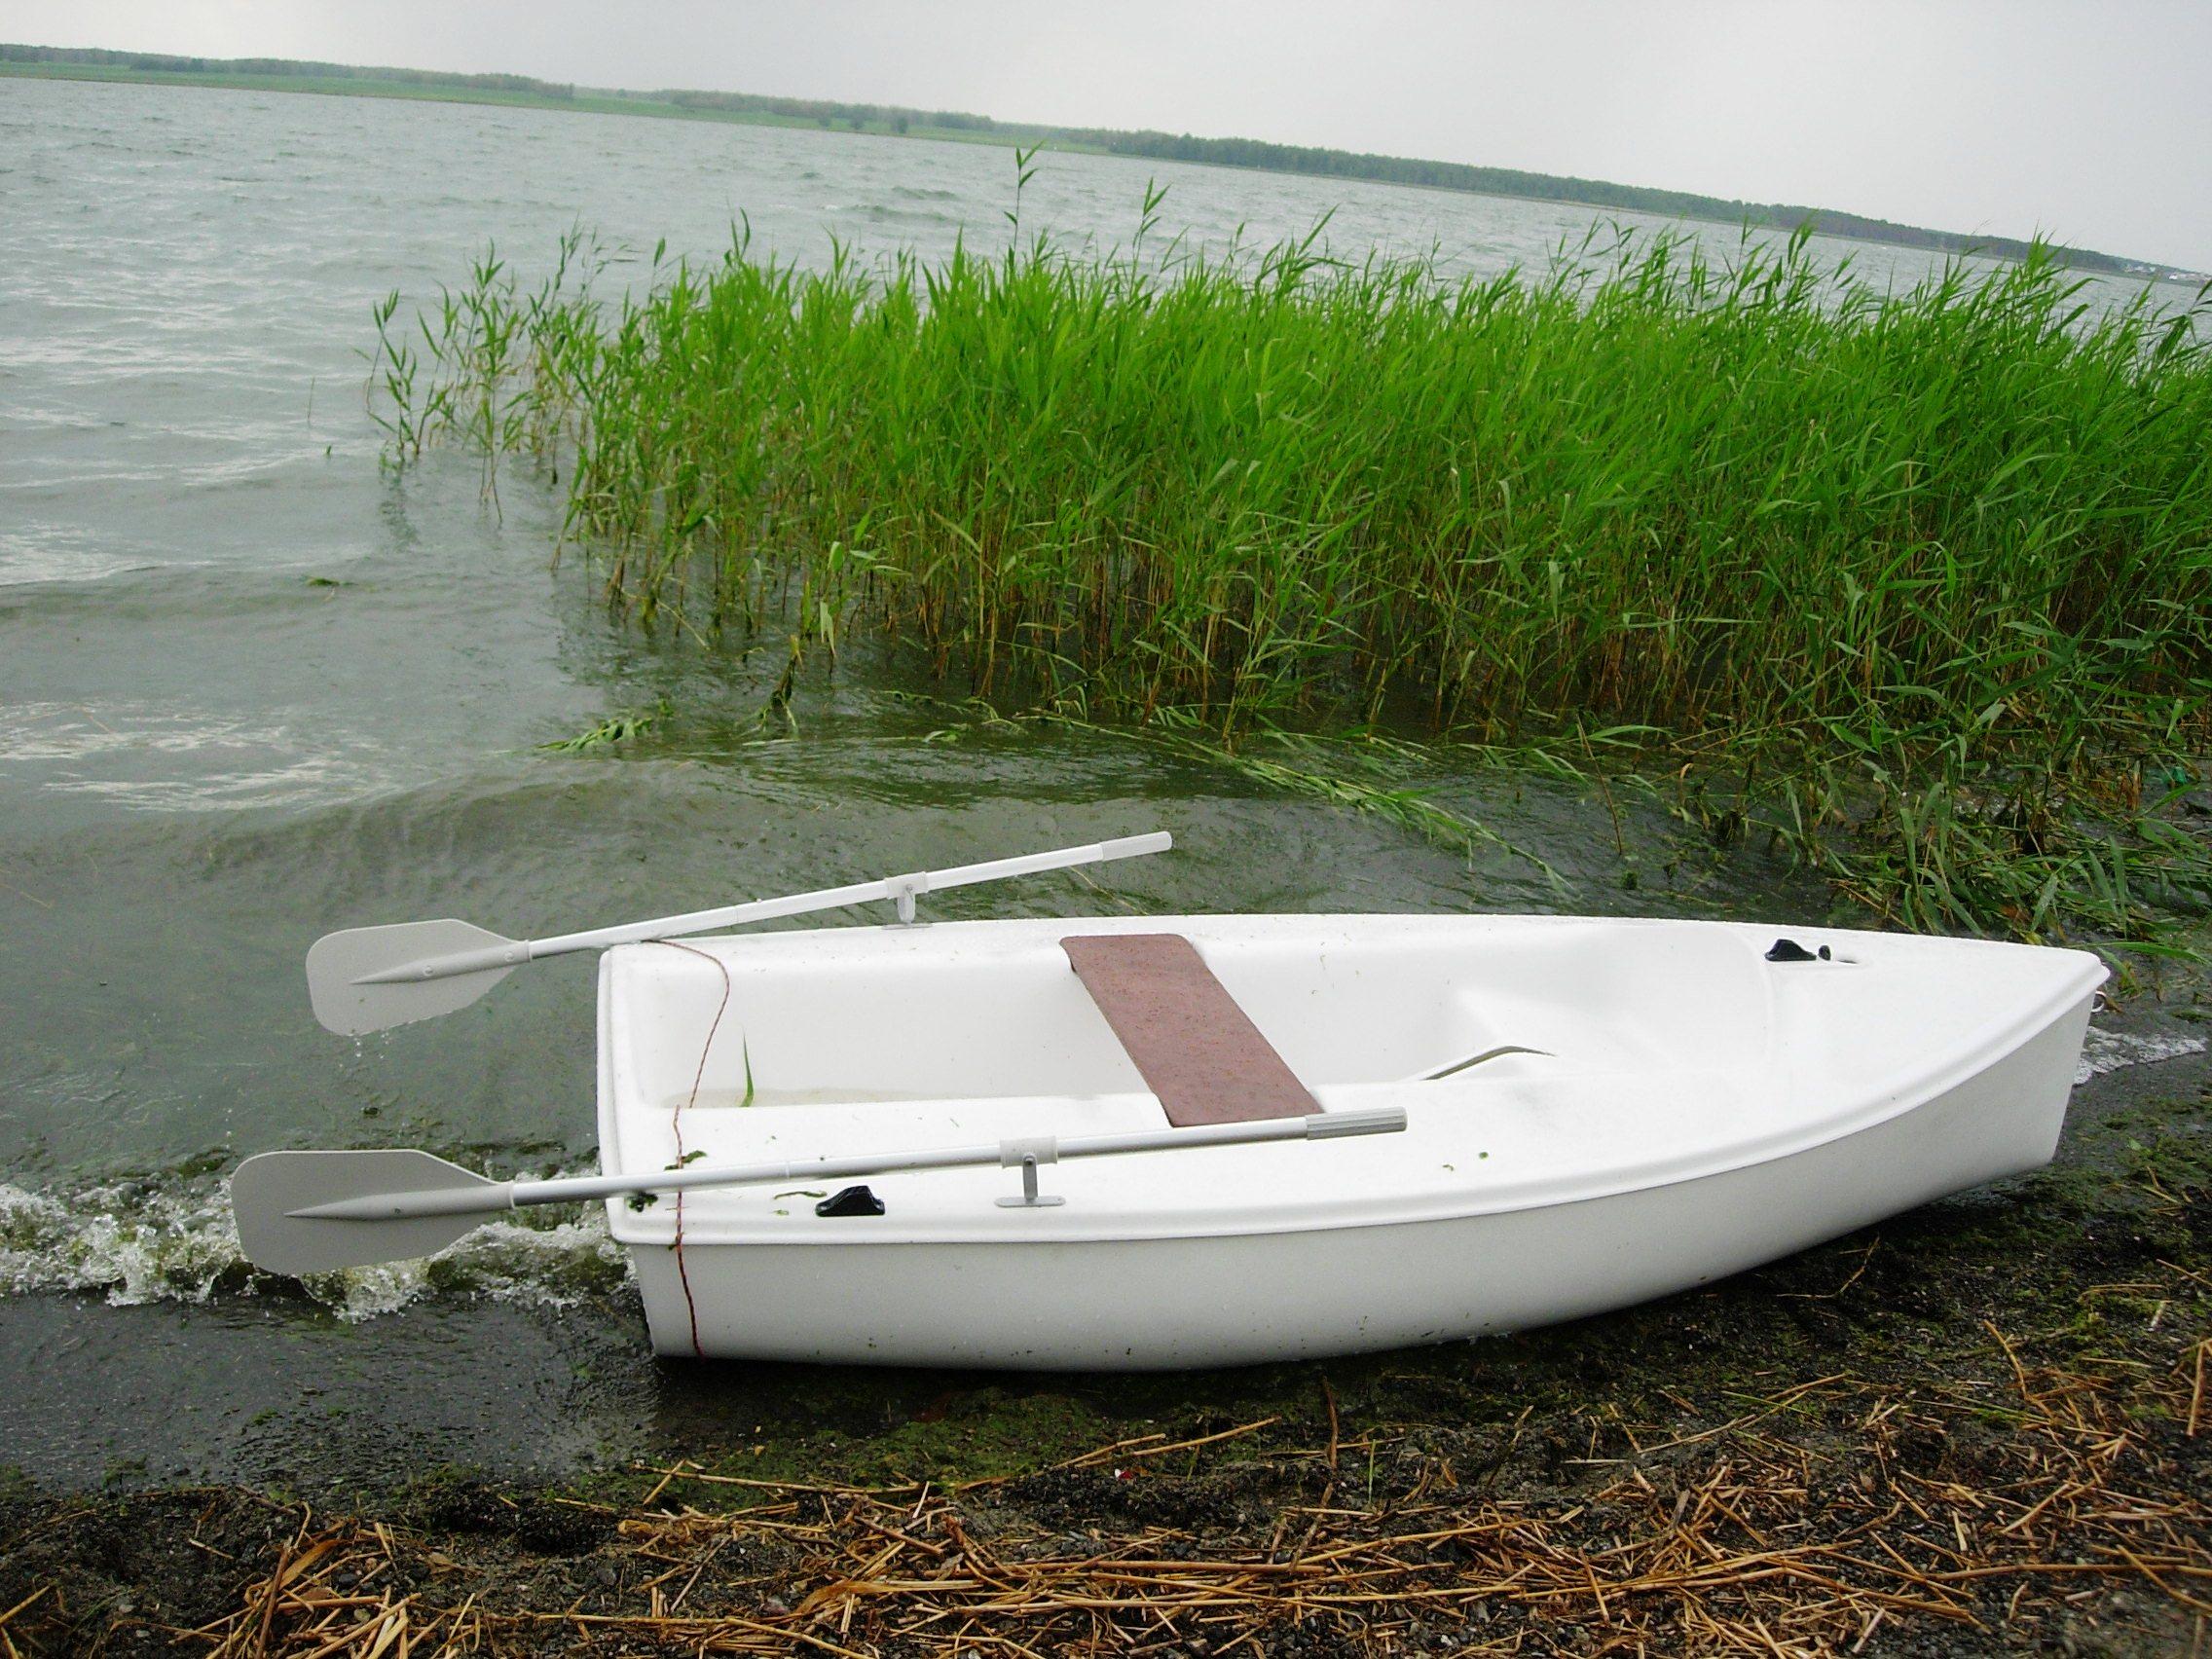 купить лодку на дачу